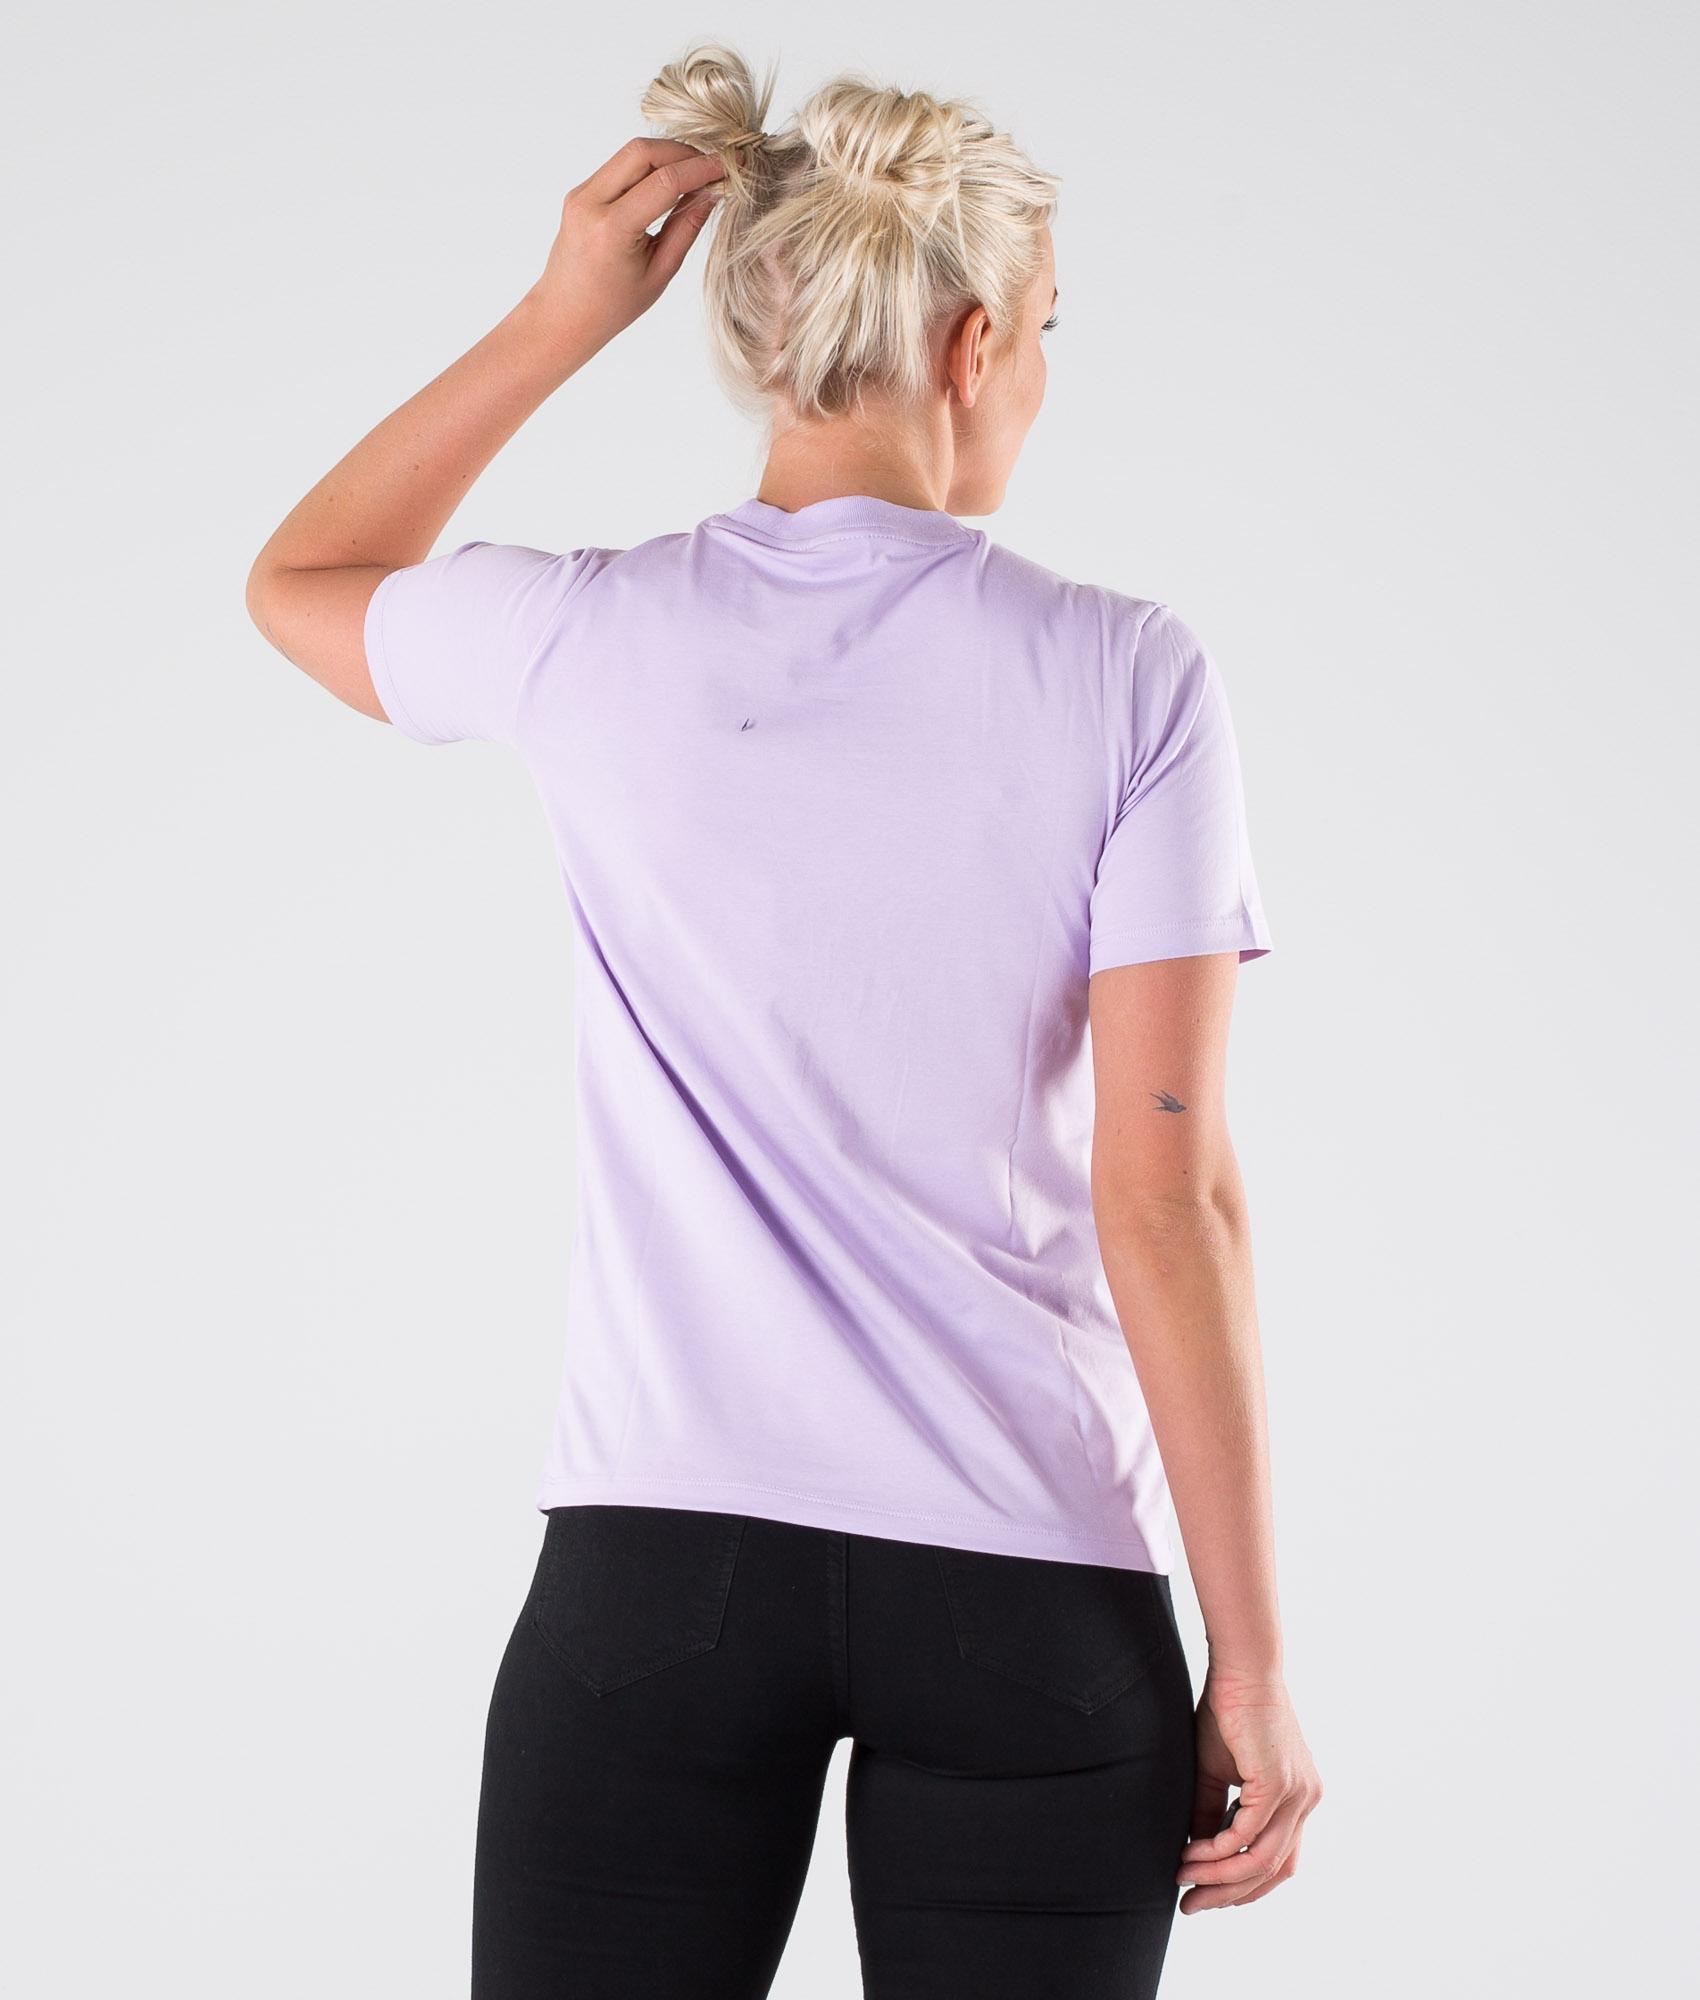 Adidas Originals Trefoil T shirt Purple Glow